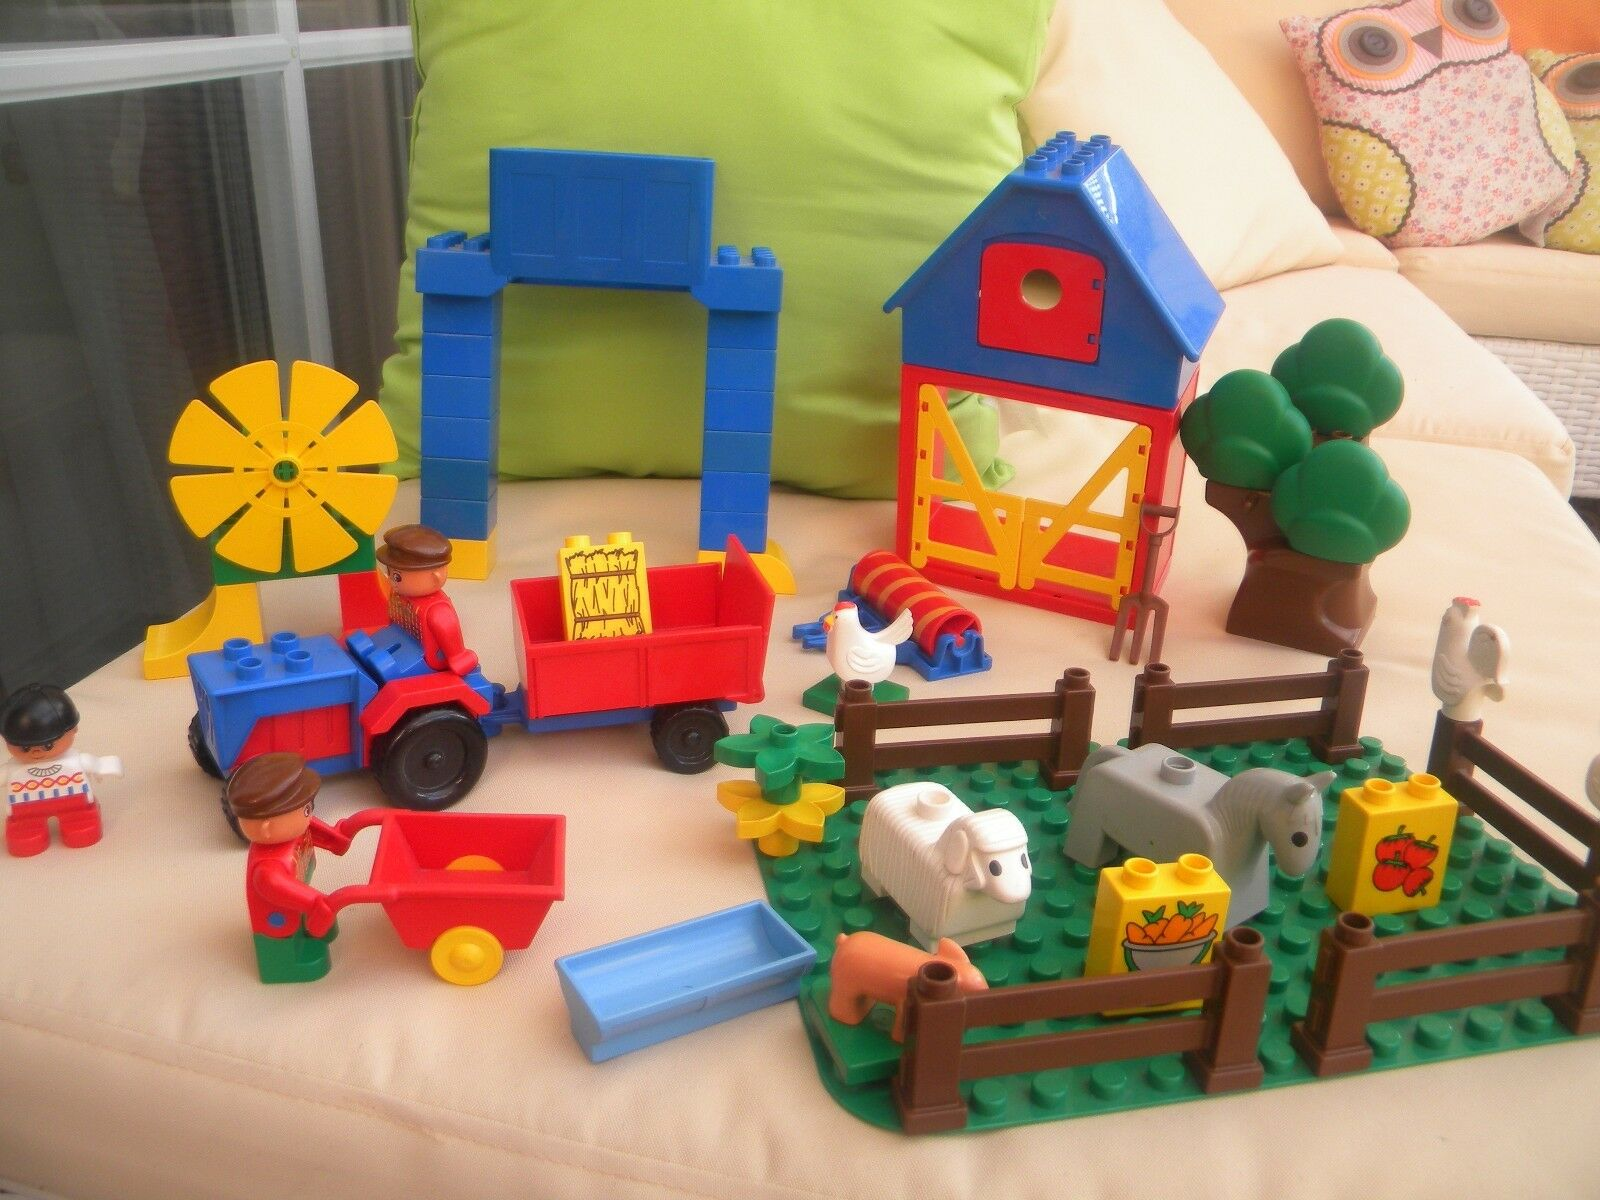 LEGO Duplo Bauernhof  großes Set Platte Haus Tiere Figuren Traktor Baum ect TOP